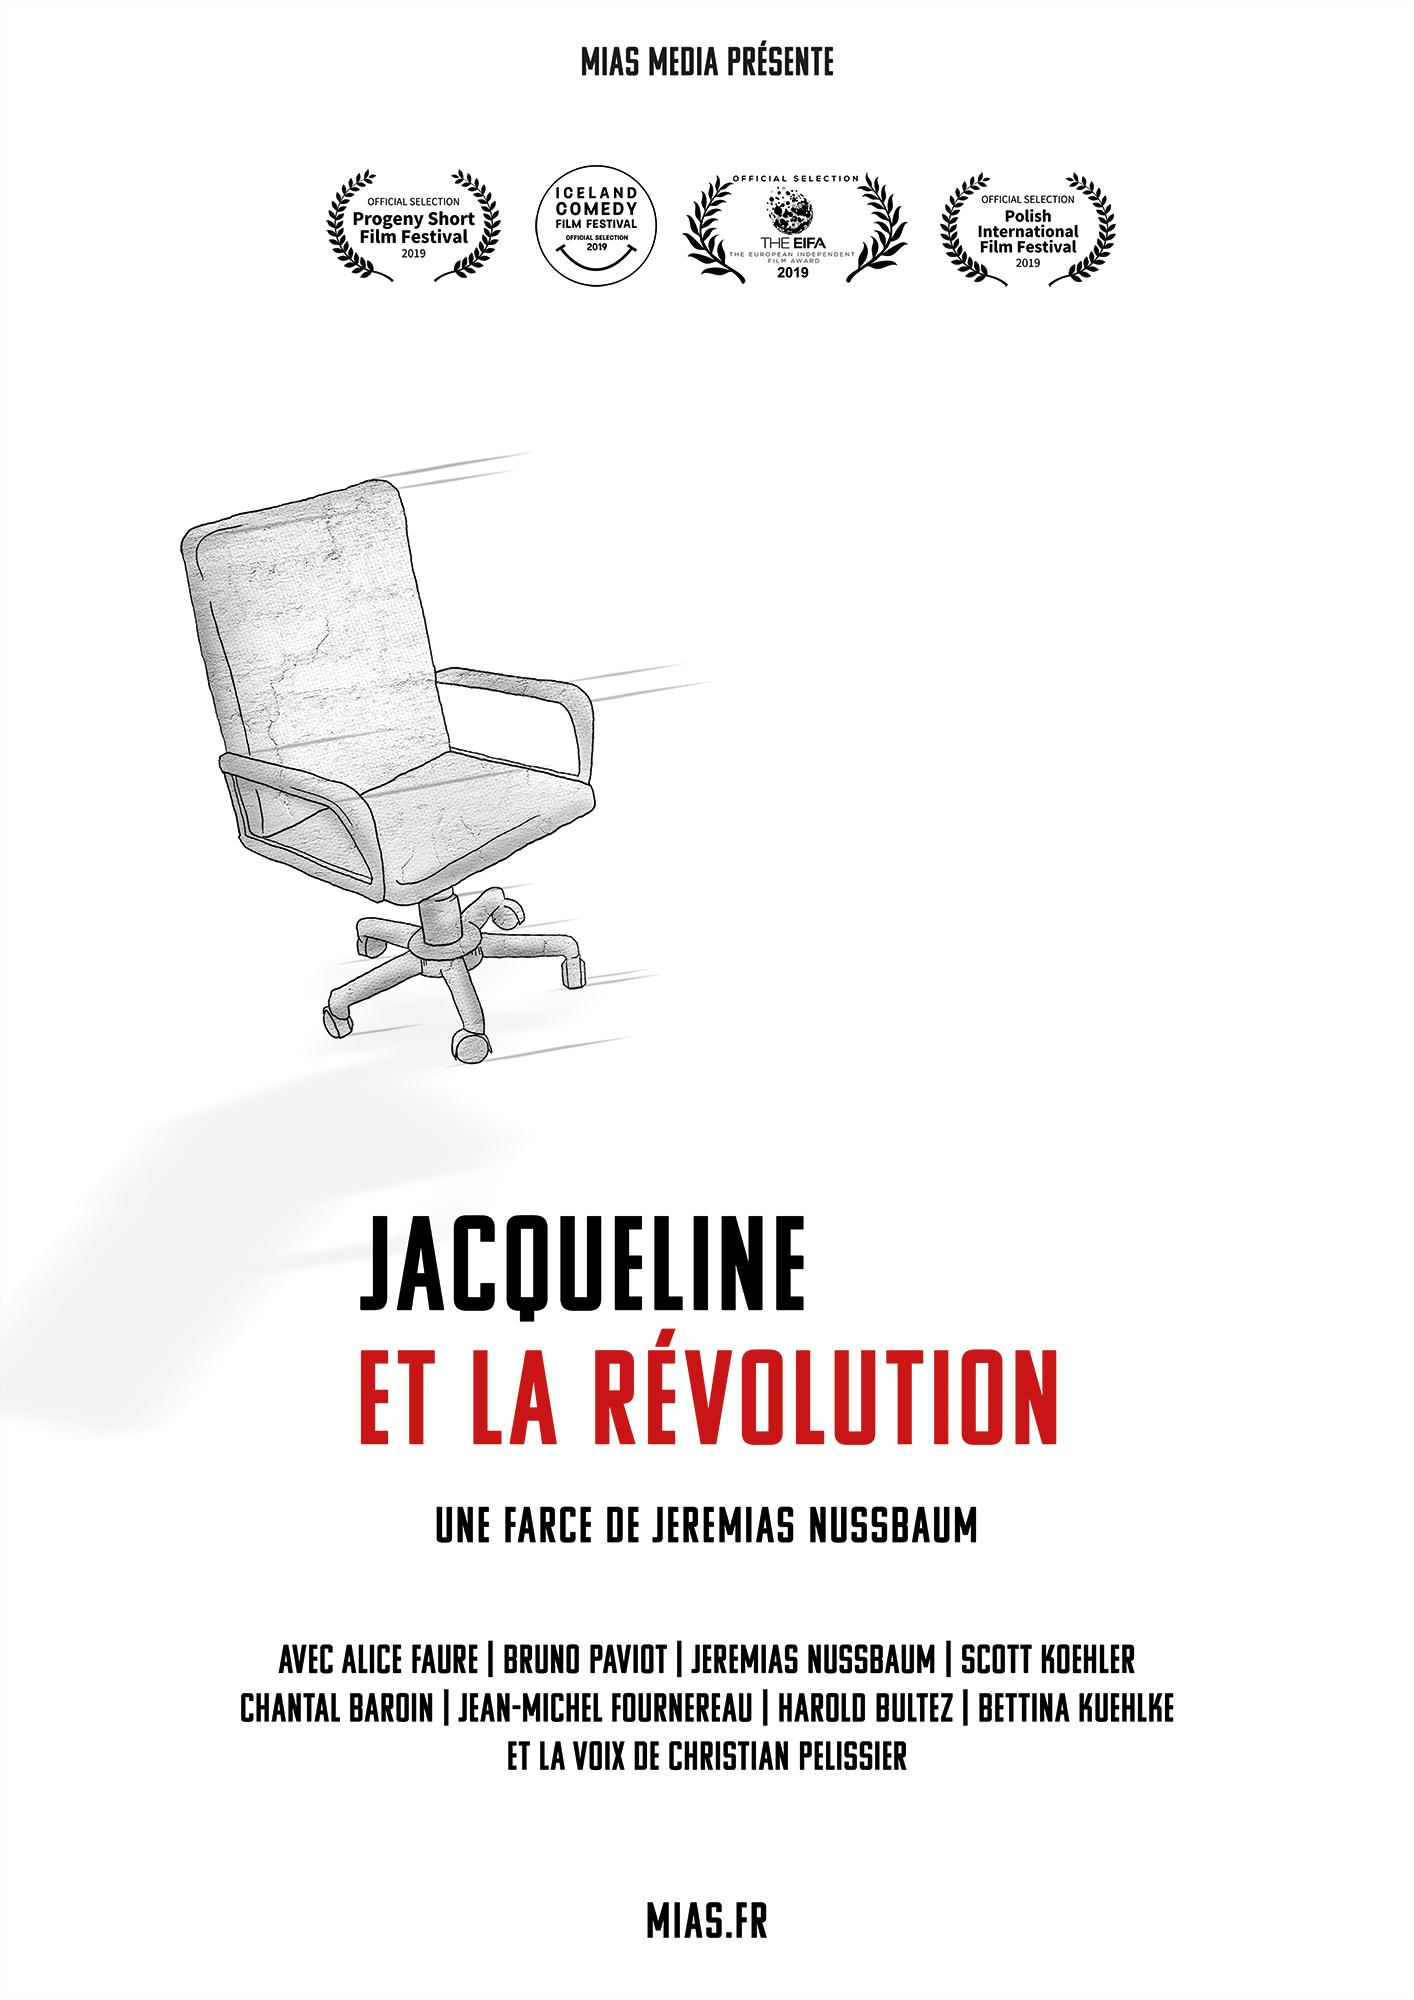 Jacqueline's revolution